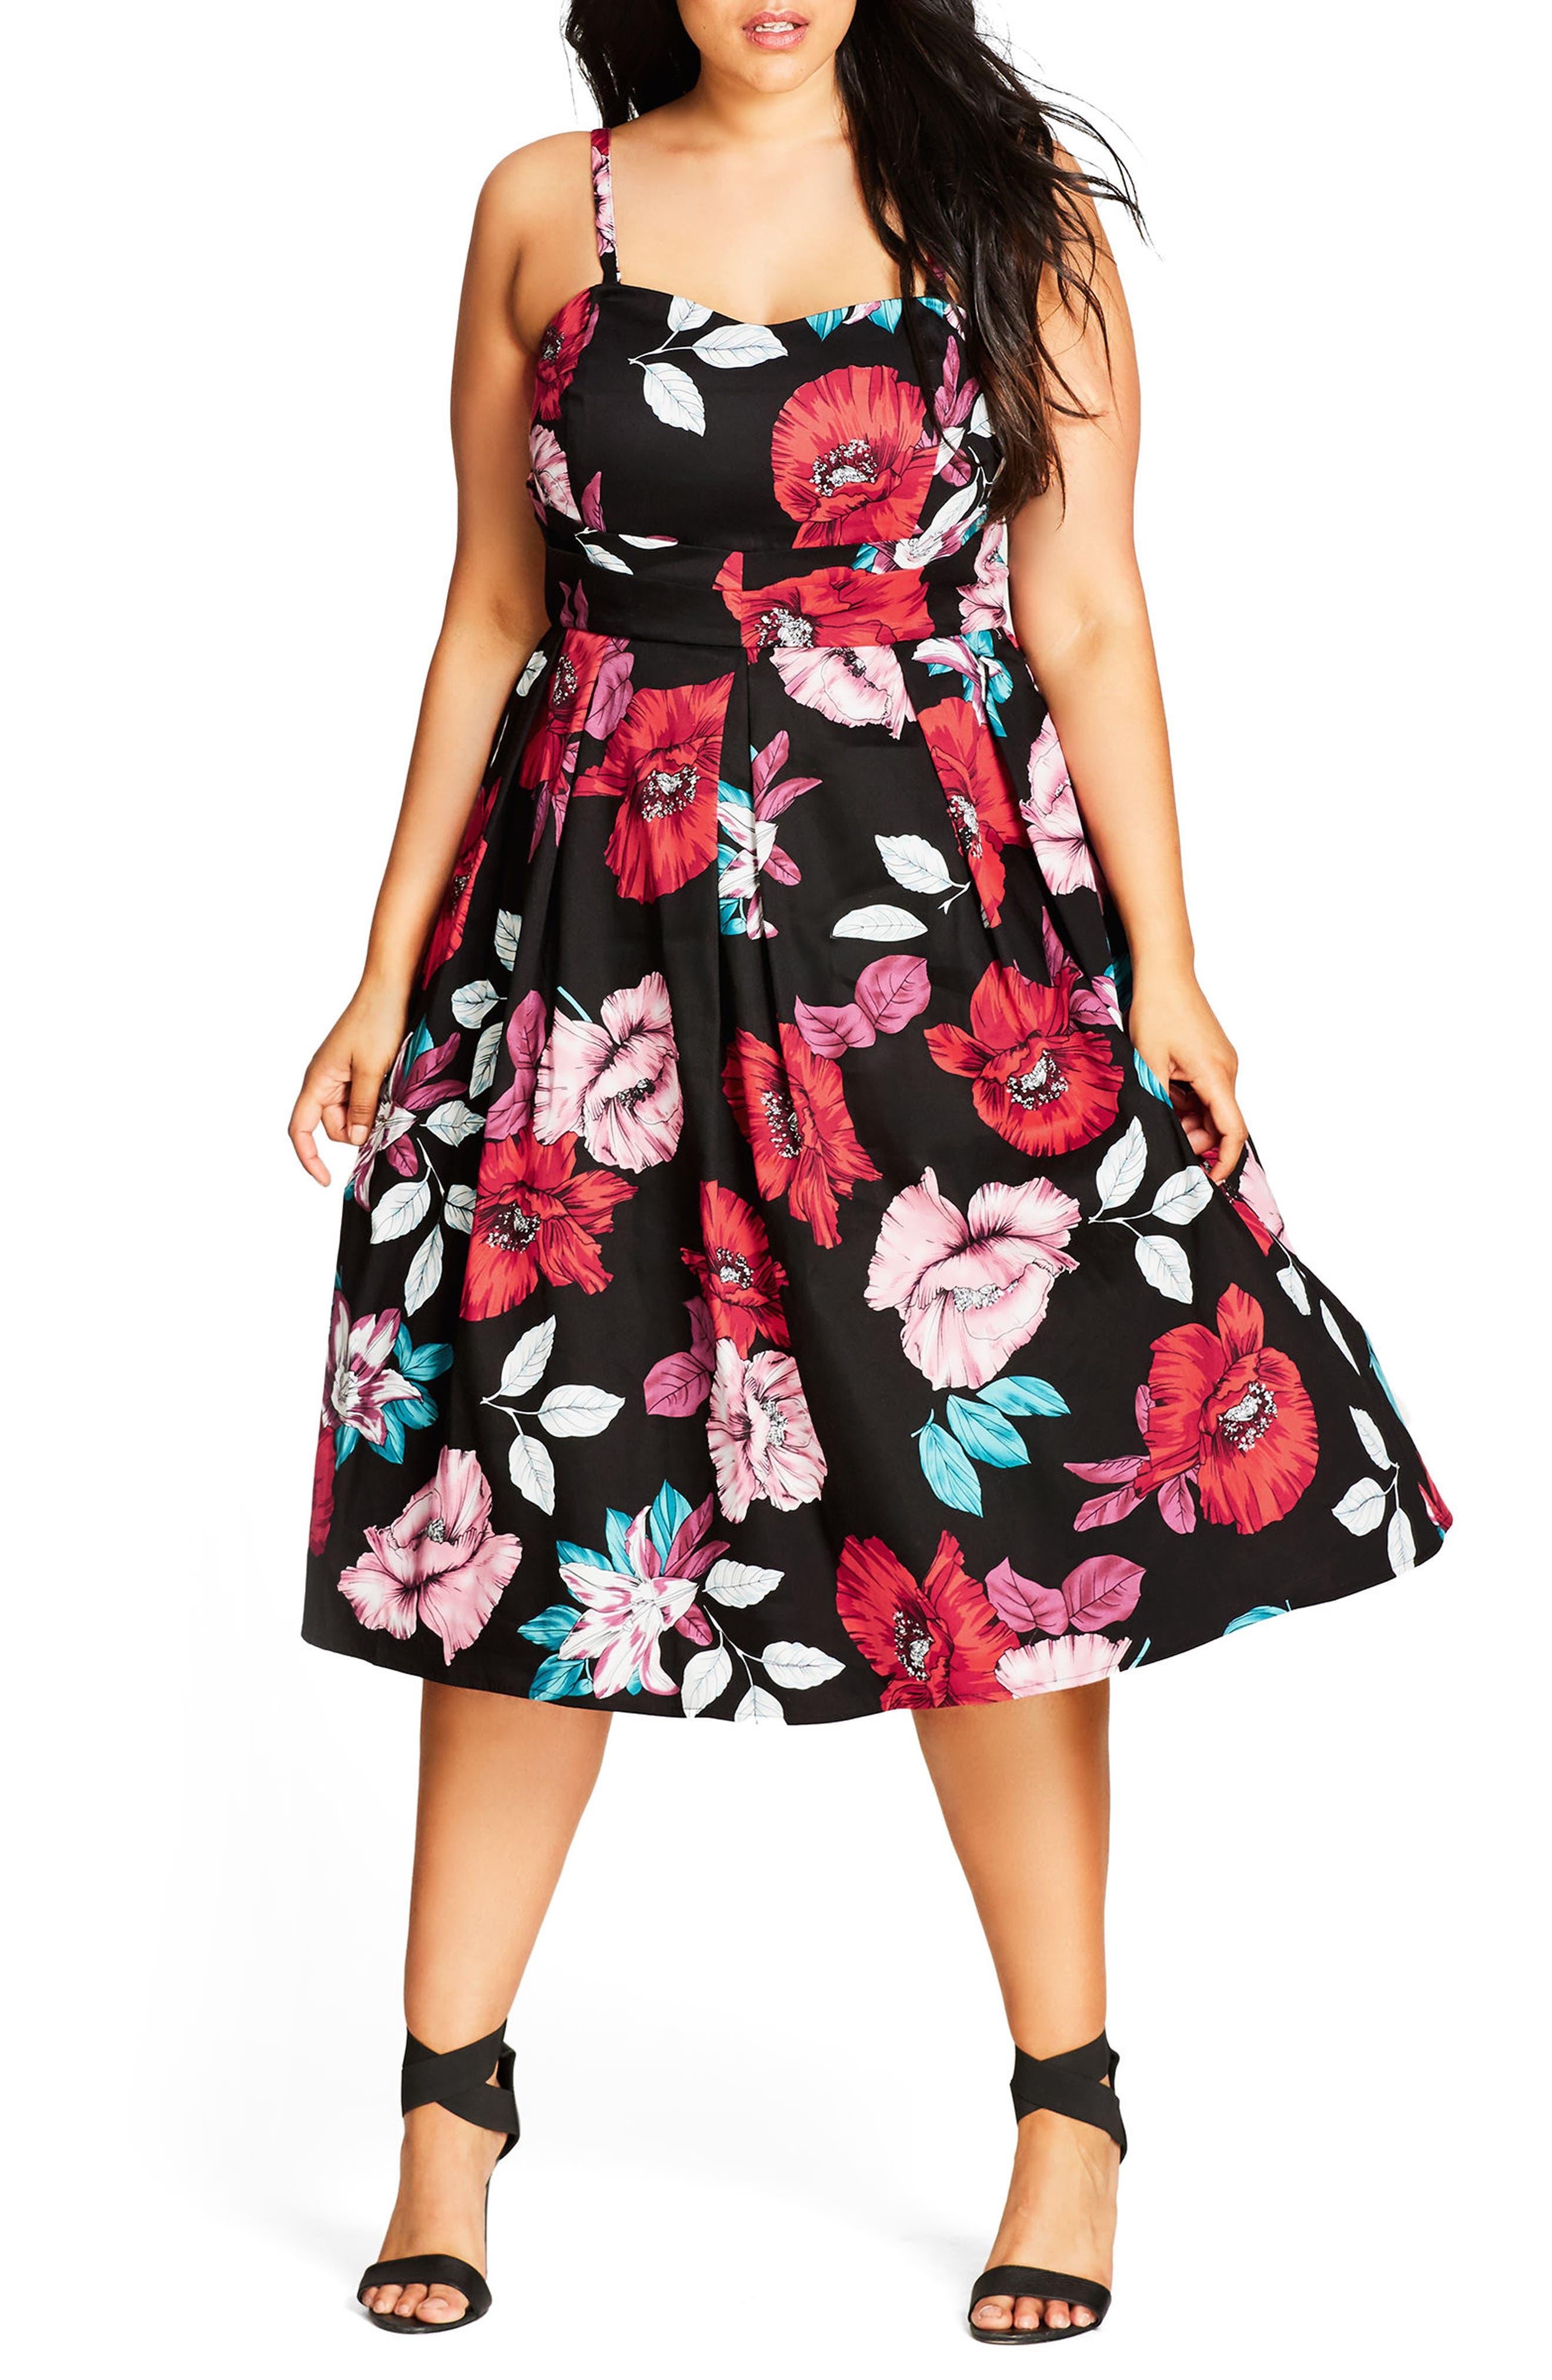 Main Image - City Chic Poppy Garden Fit & Flare Dress (Plus Size)